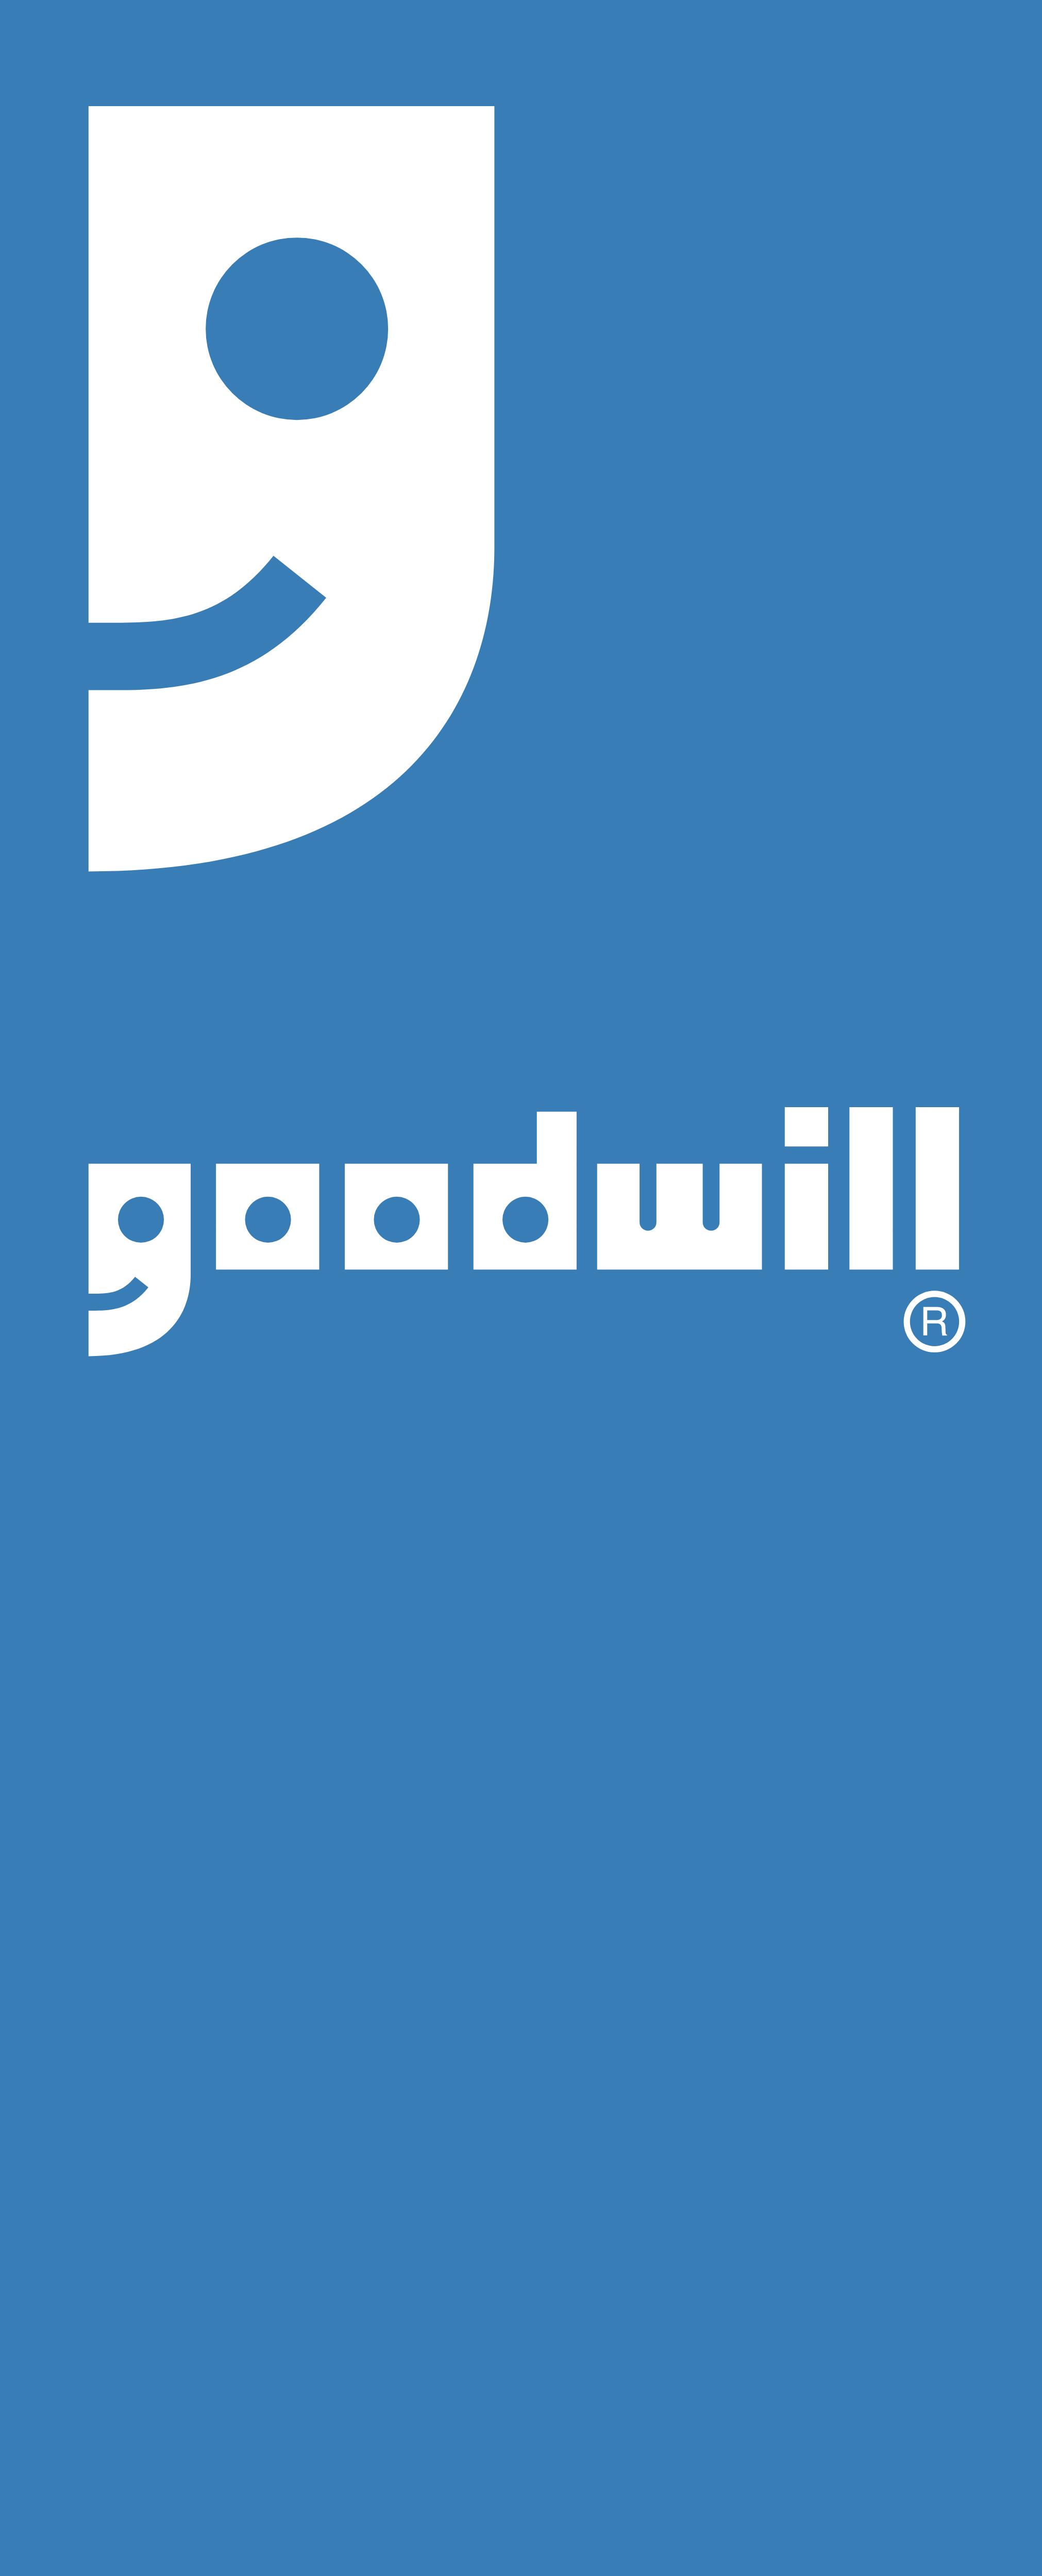 goodwill � logos download